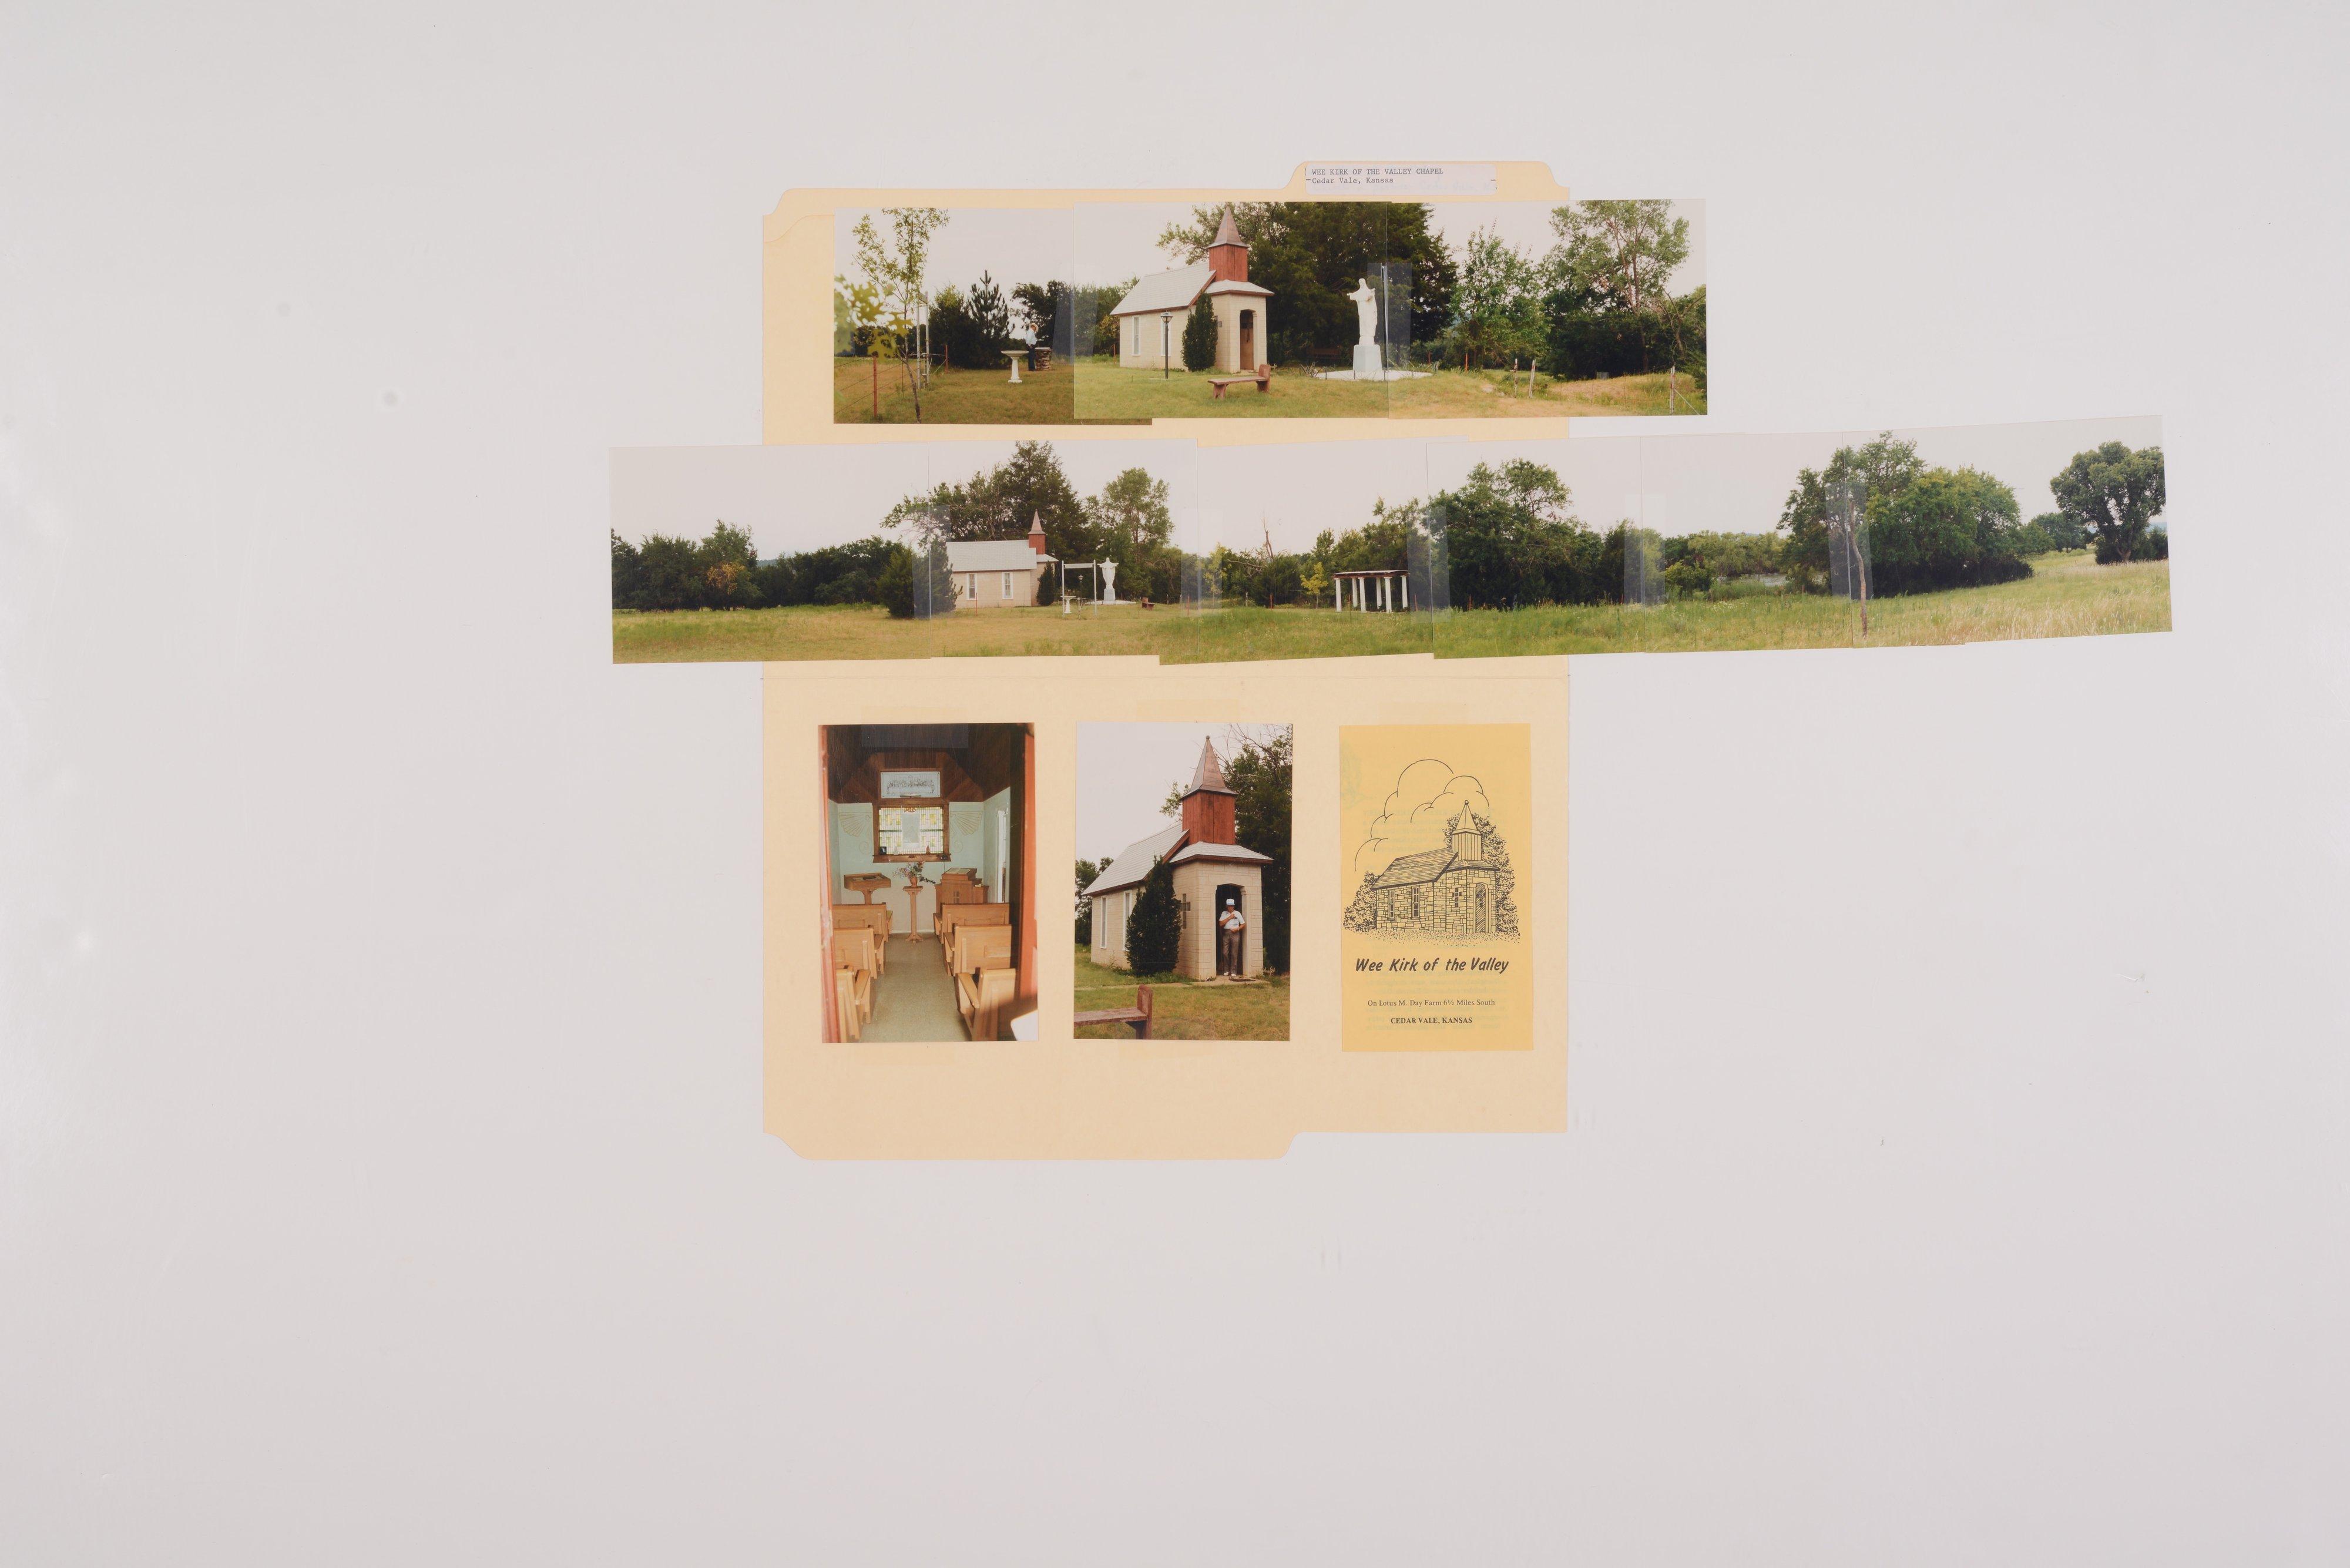 Kansas Film Commission site photographs, subject churches - 4